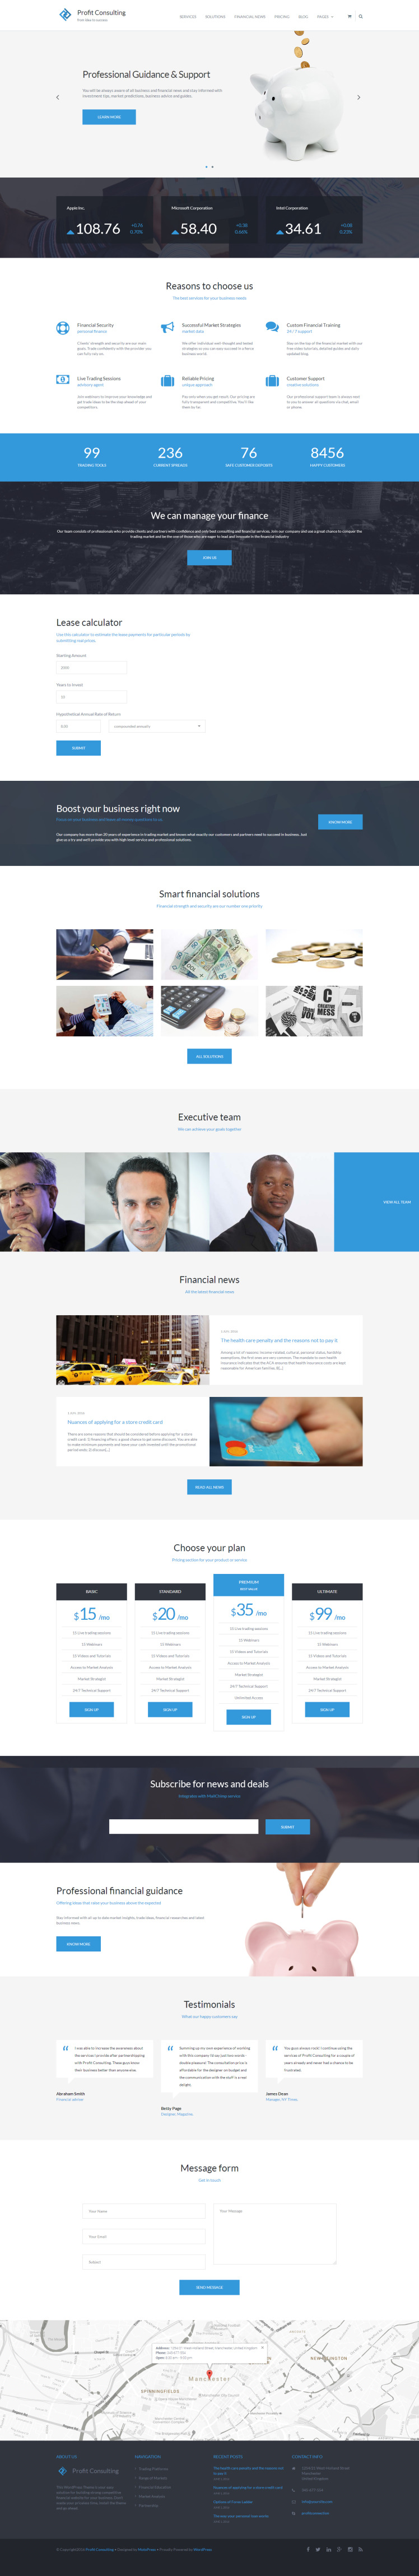 Profit Consulting Financial Advisor WordPress Theme